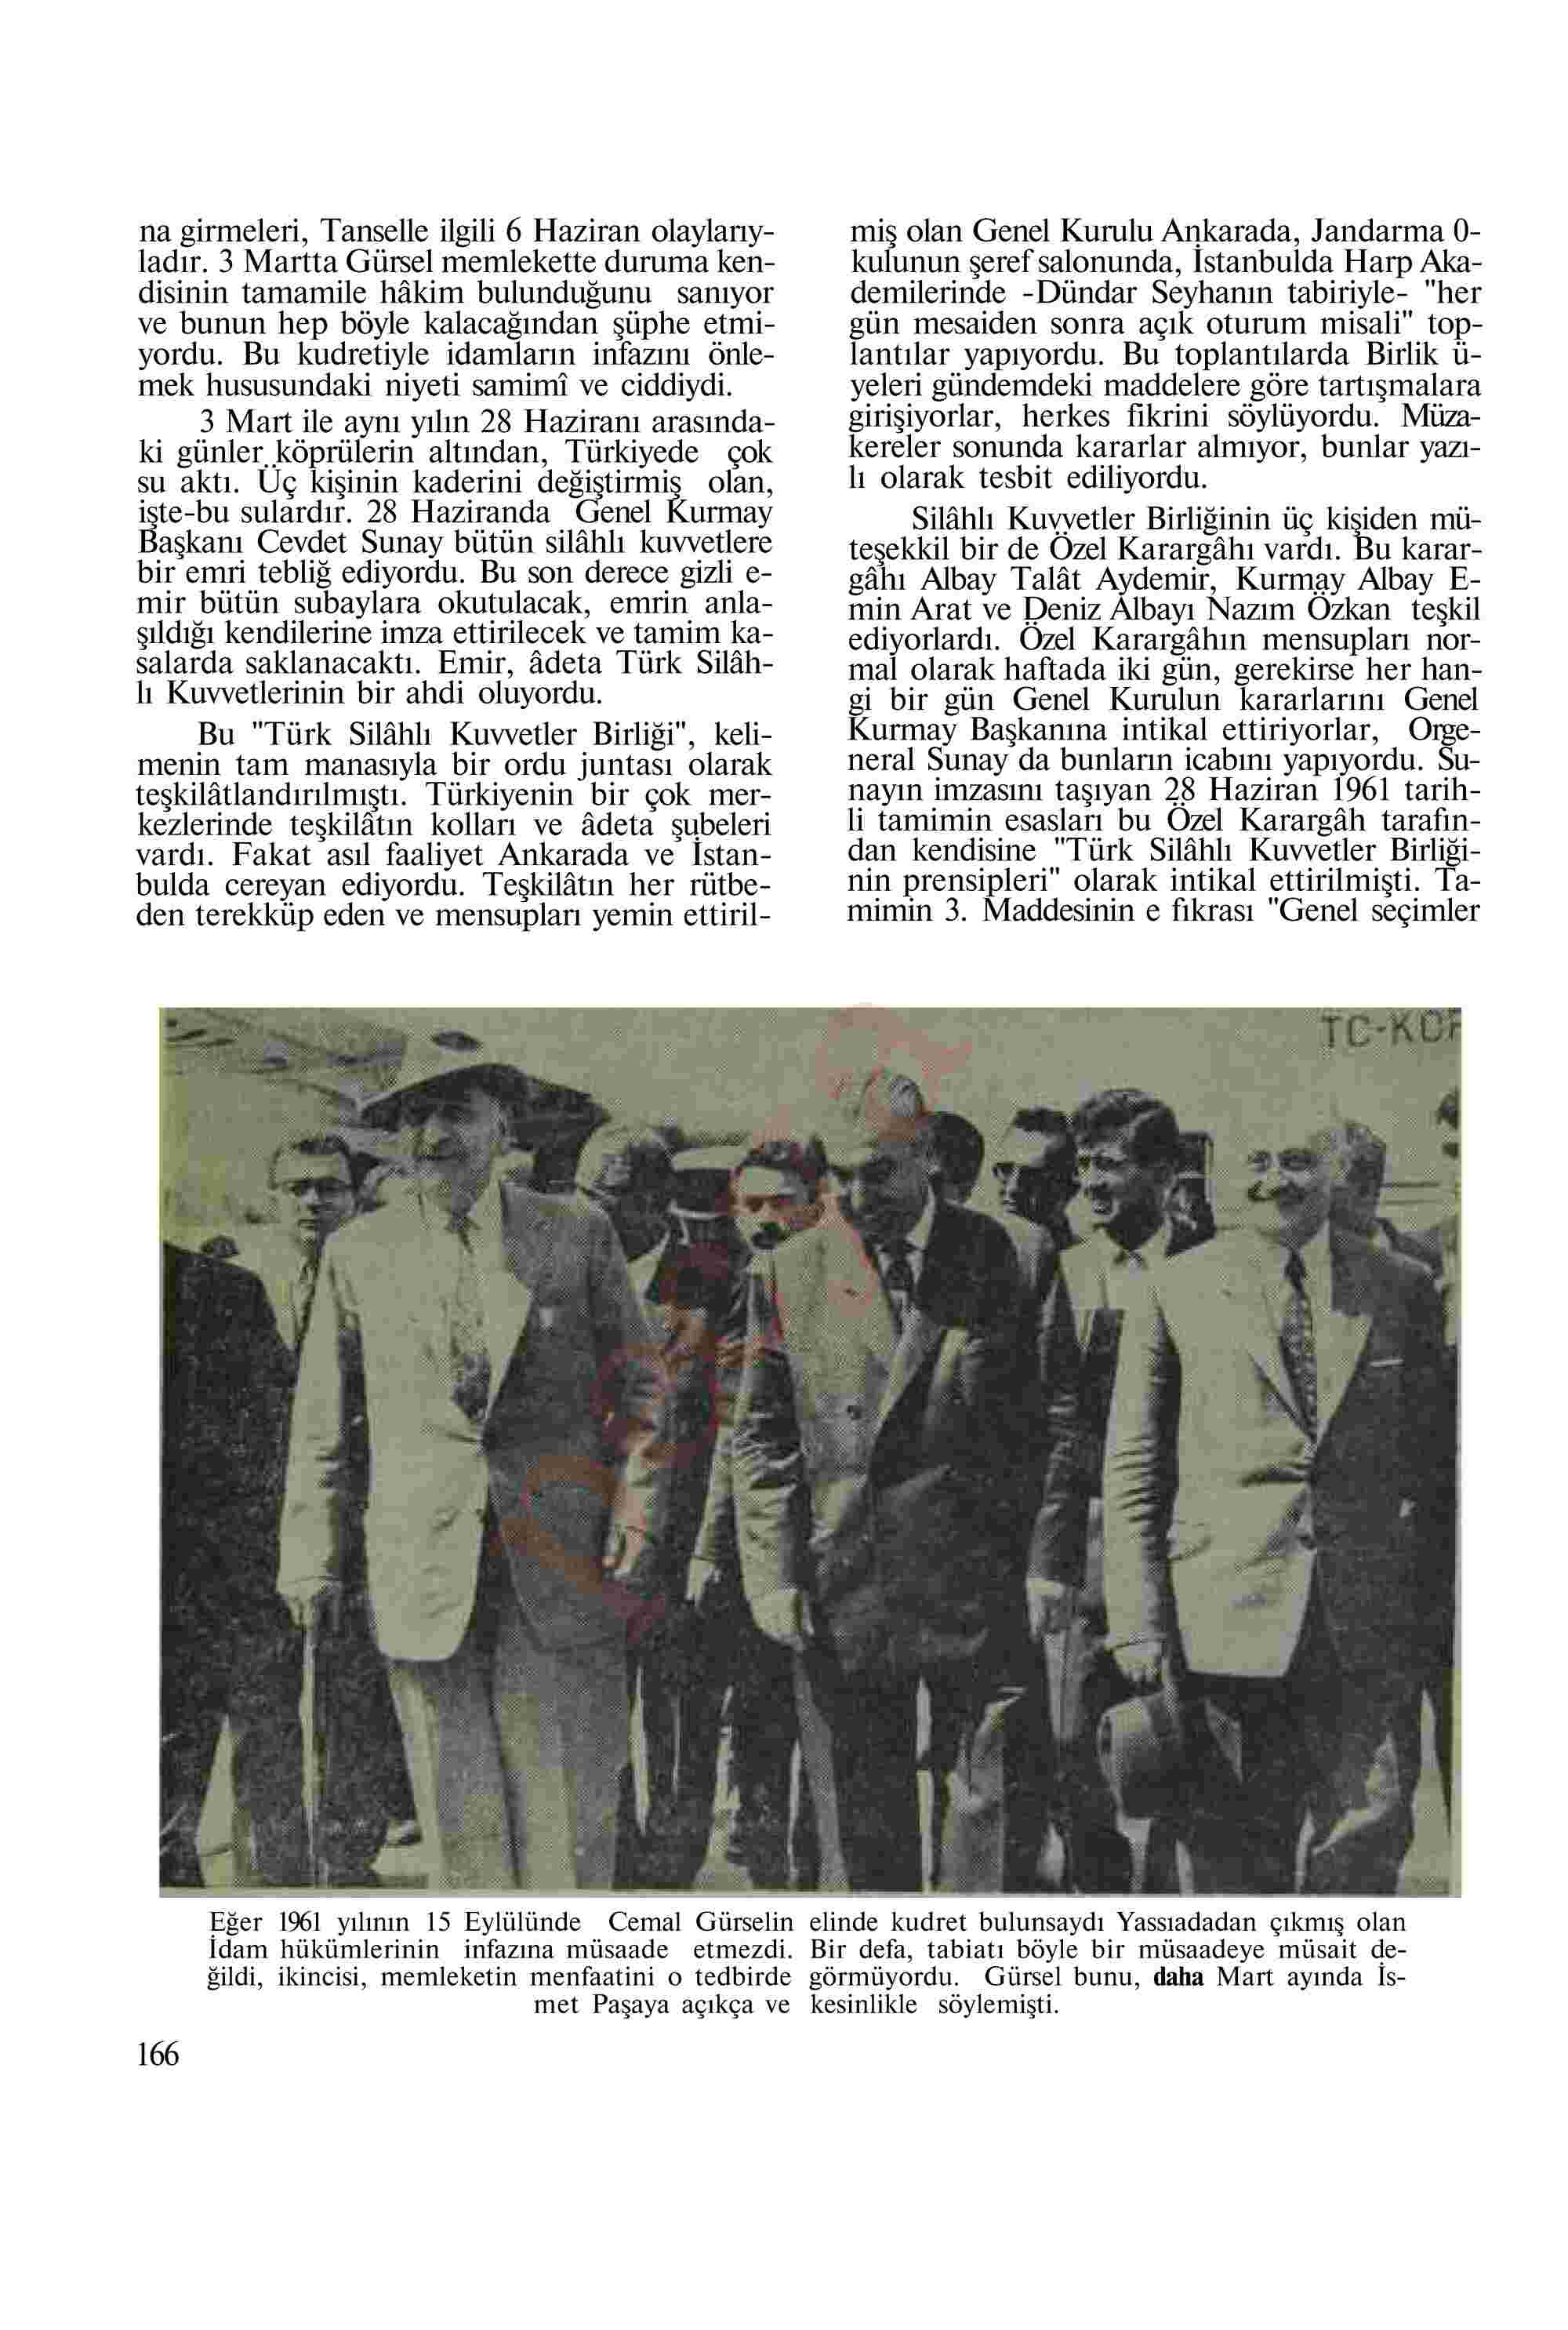 11 Mart 1967 Tarihli Akis Dergisi Sayfa 16